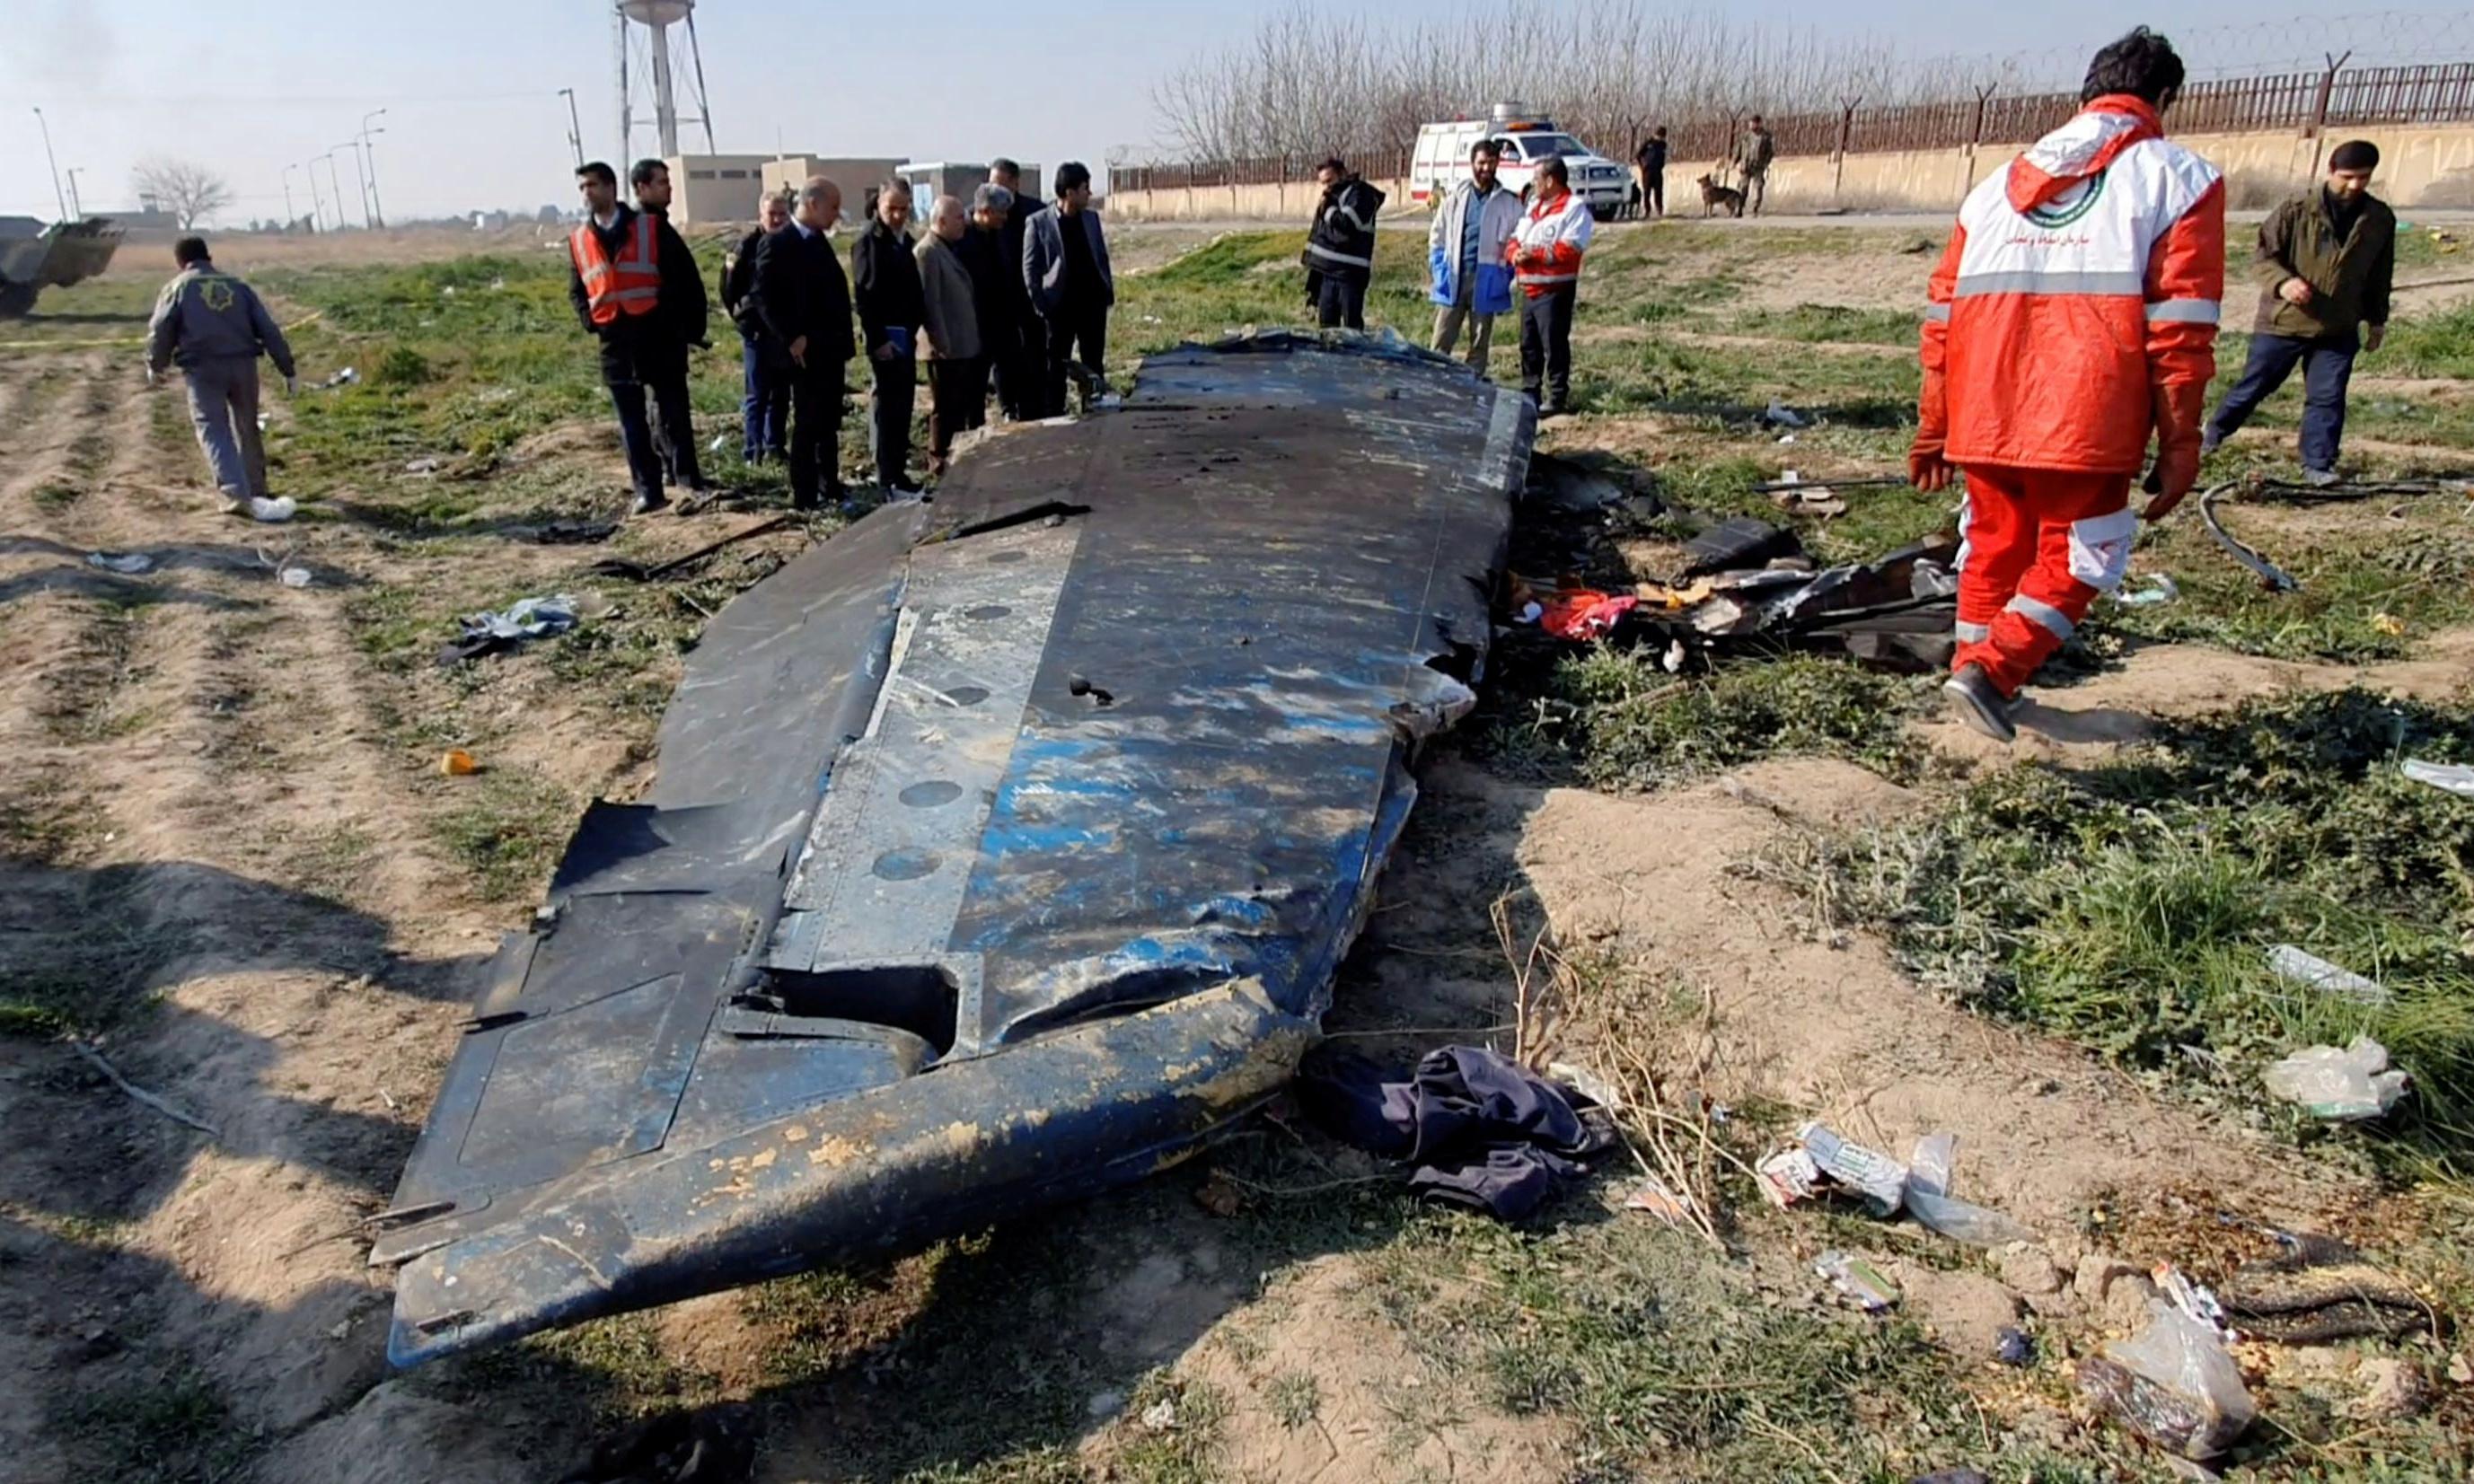 Iran under growing pressure to hand over Ukraine jet black box